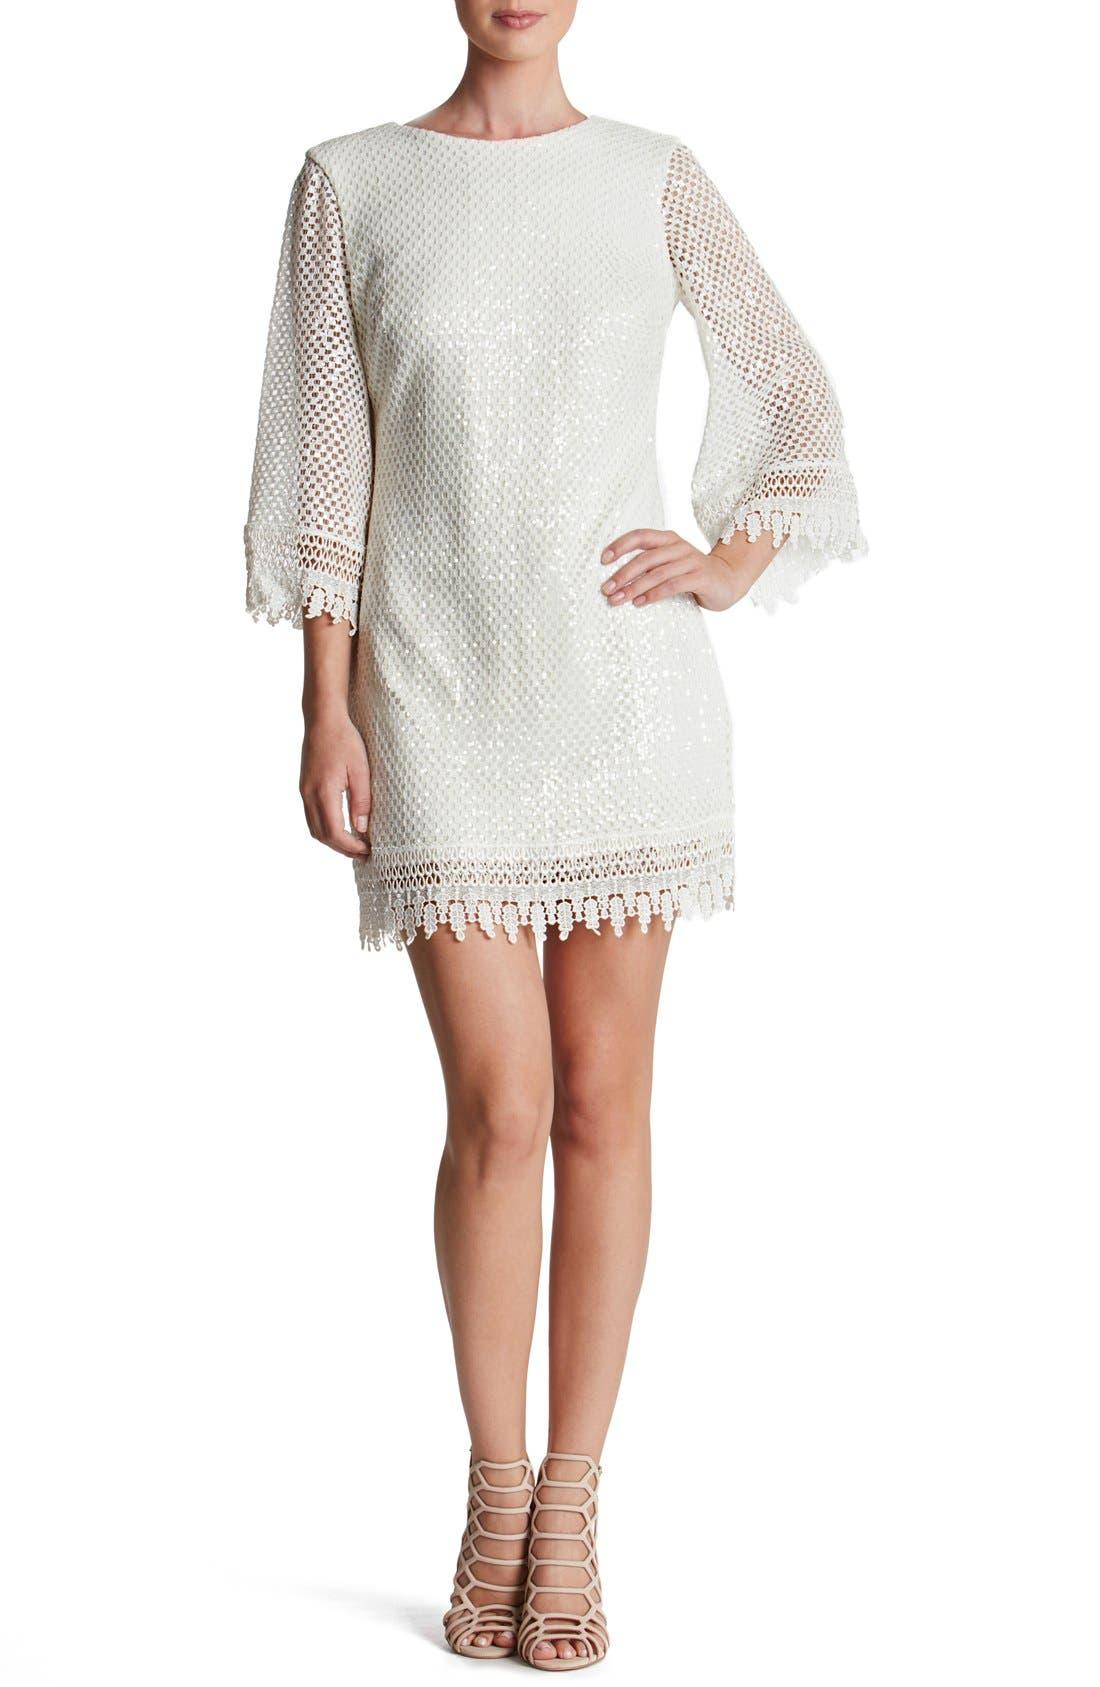 Alternate Image 1 Selected - Dress the Population 'Phoebe' Sequin Crochet Shift Dress